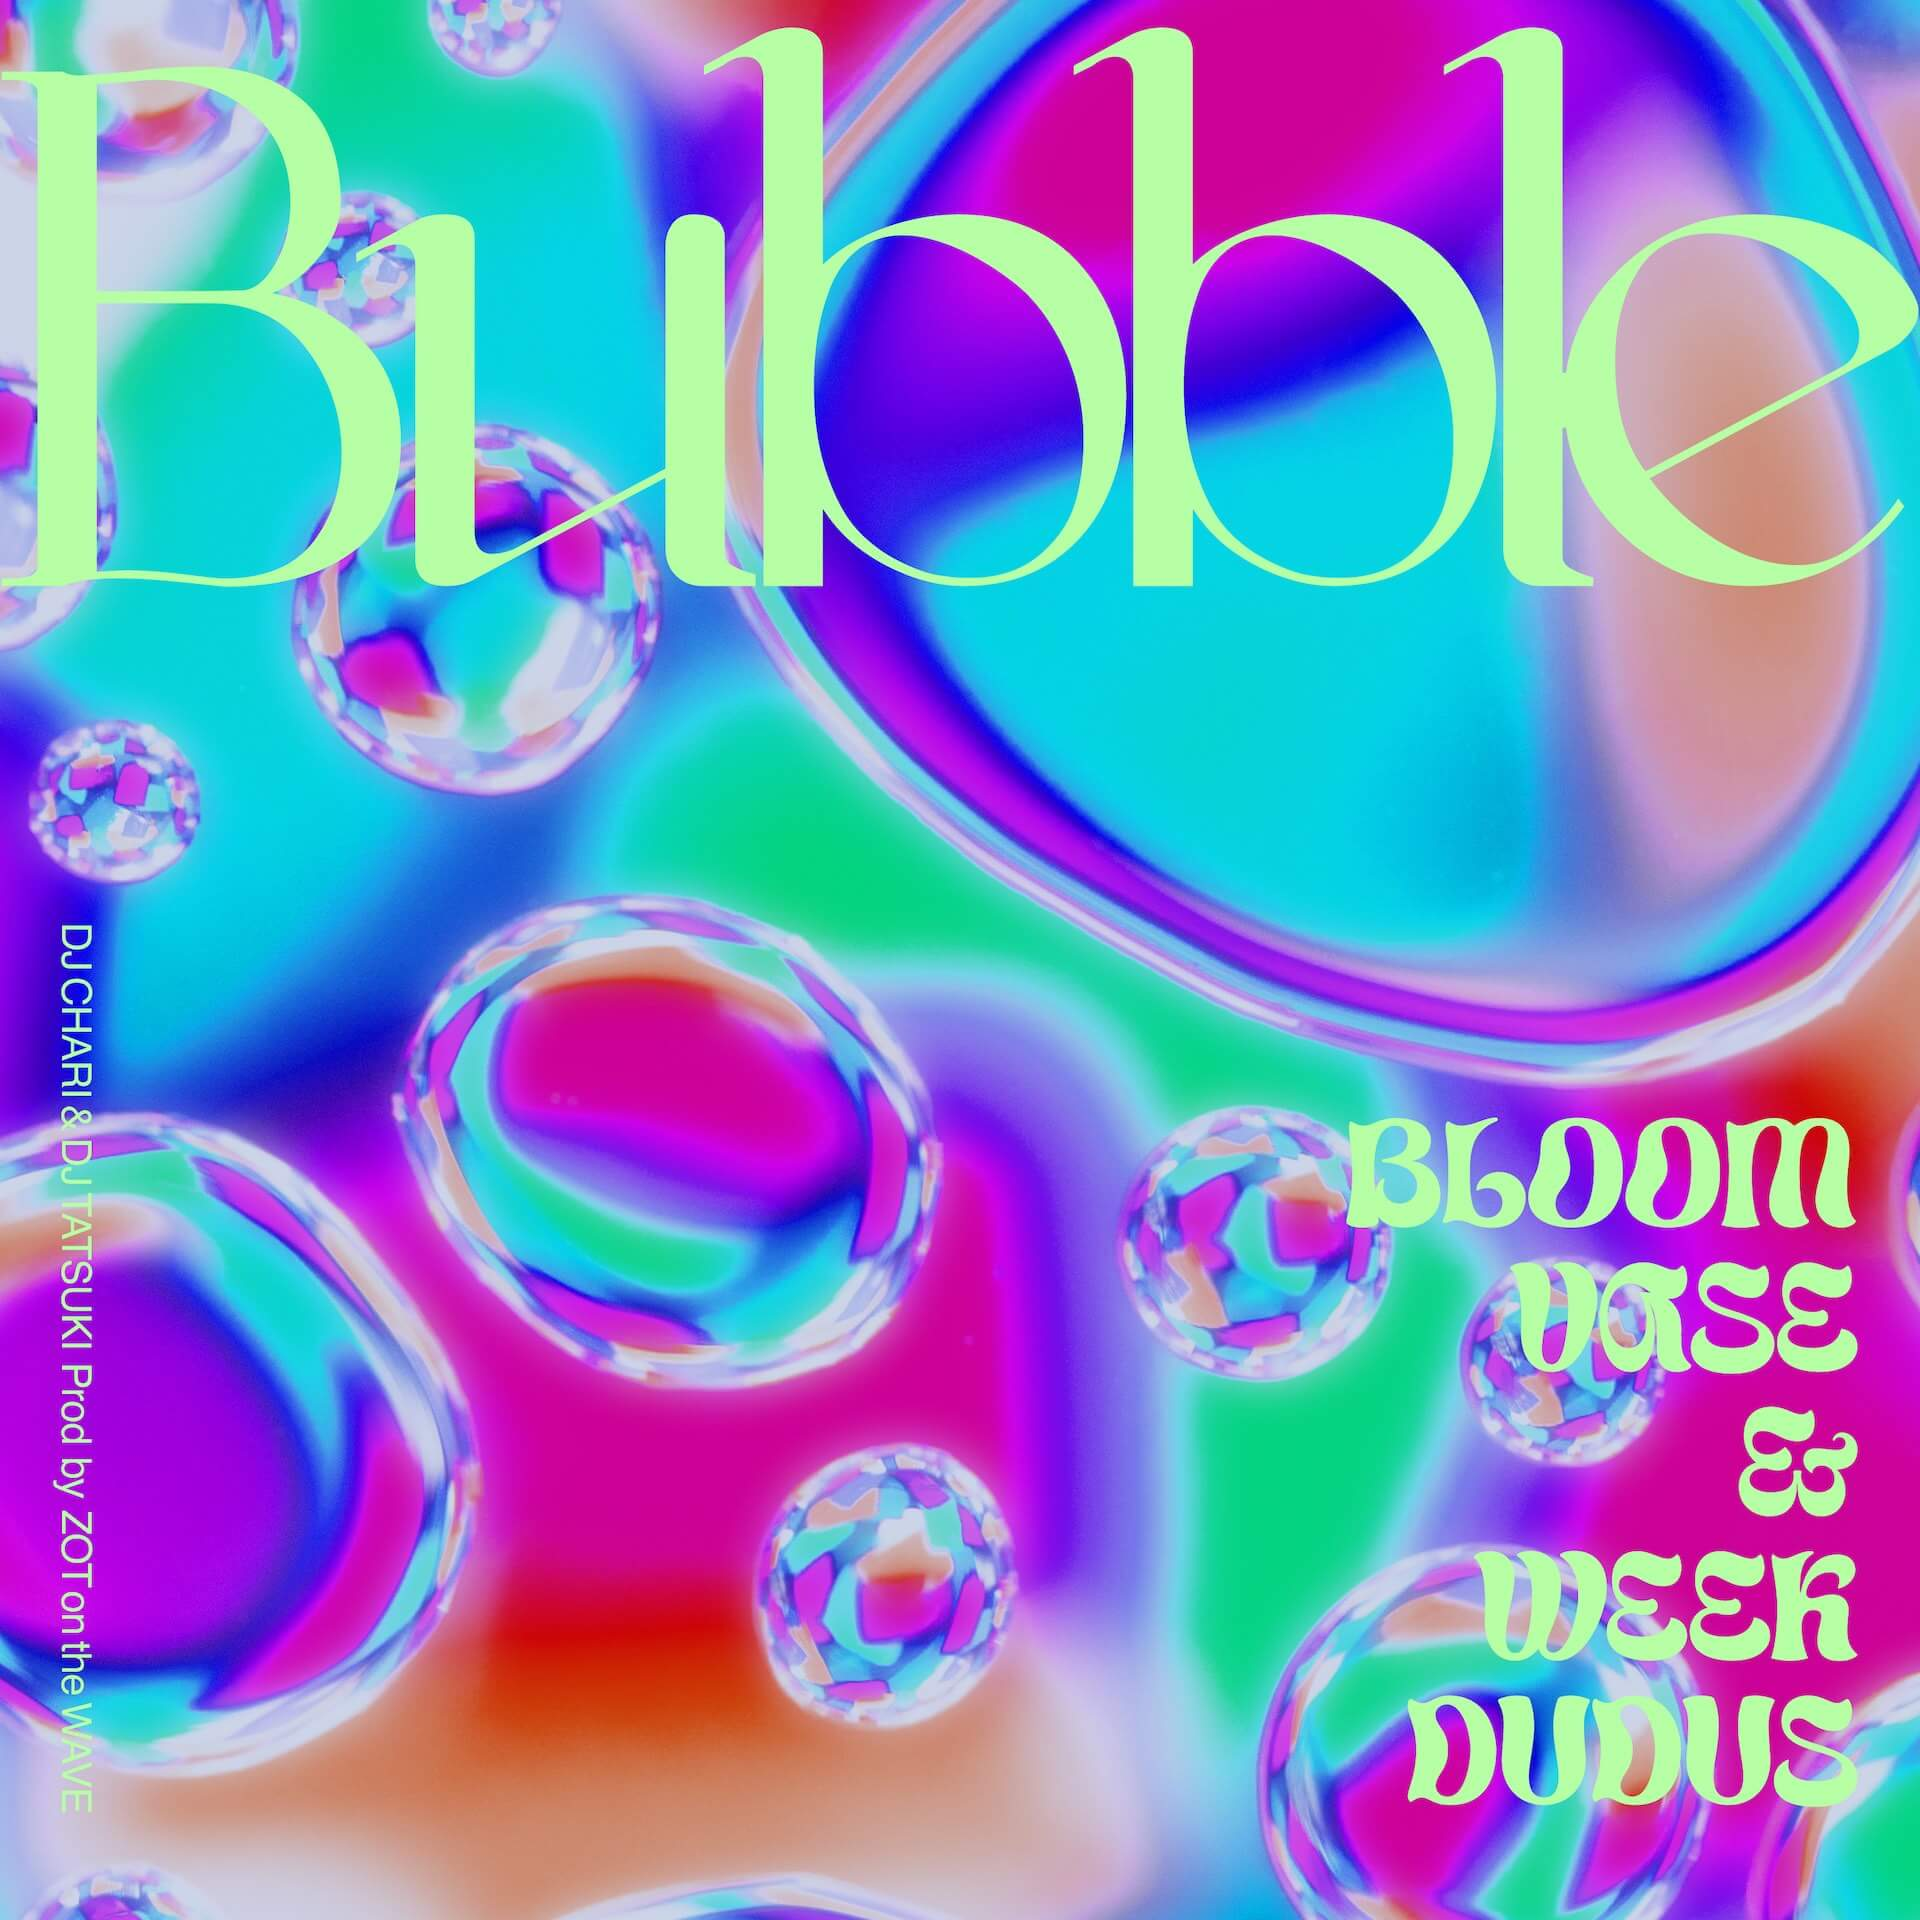 "DJ CHARI & DJ TATSUKIが3週連続シングルリリース第2弾""Bubble""を発表!MVも公開に music_210712_bubble"